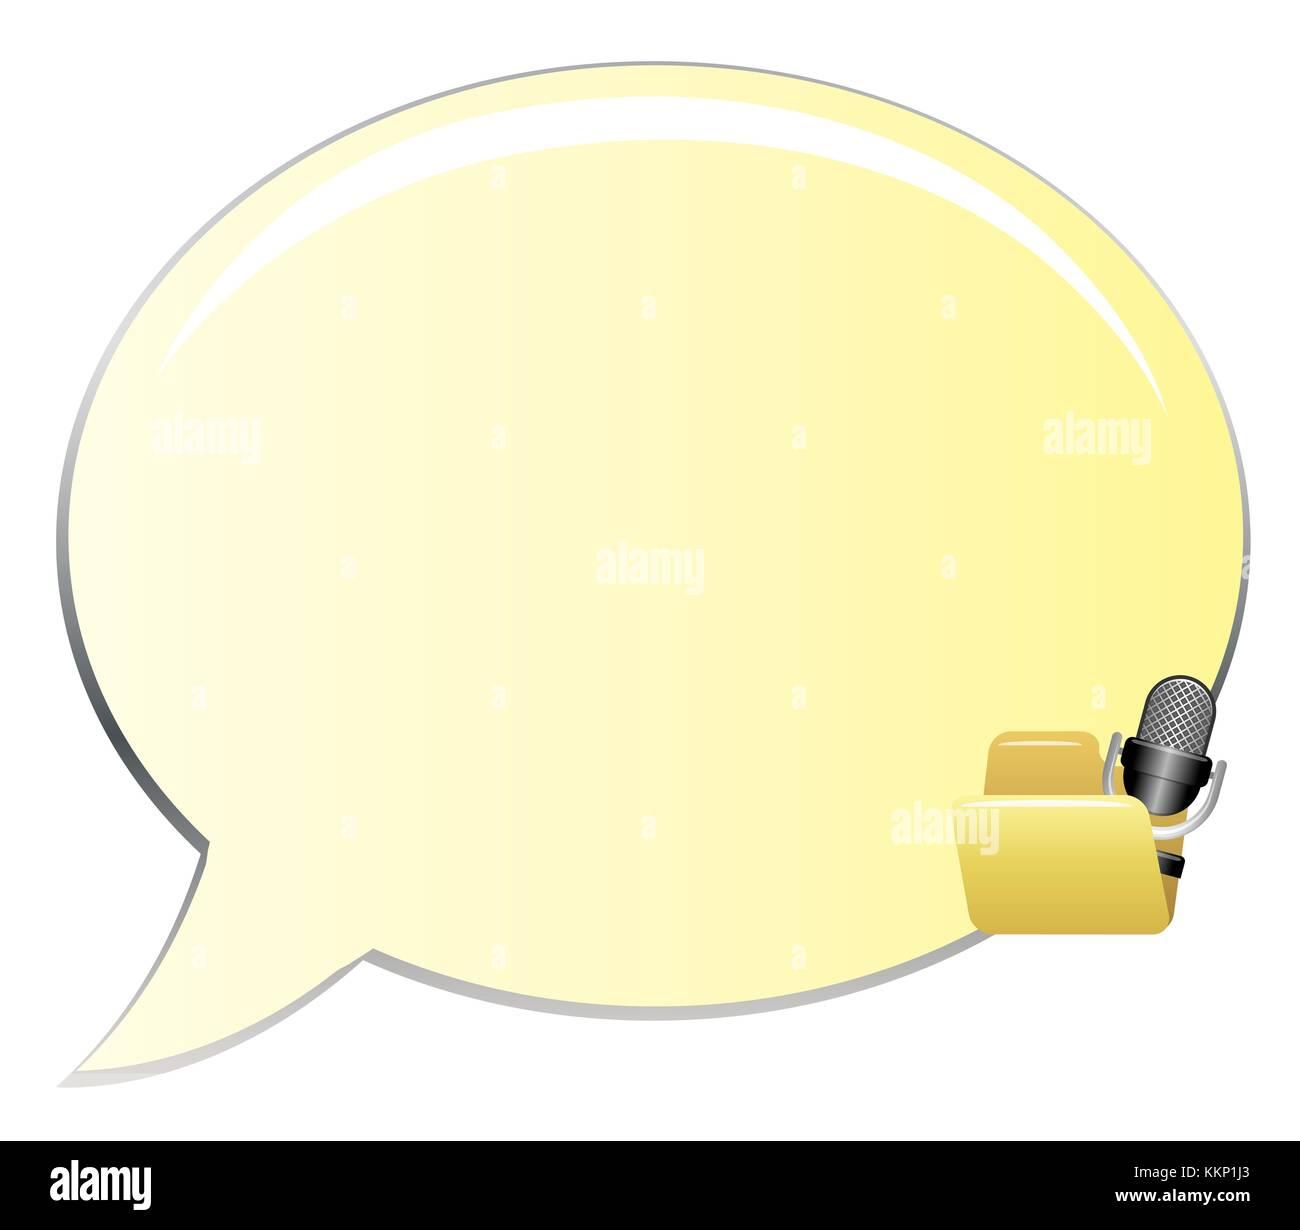 Clip art Speech Bubbles amarillo Imagen De Stock